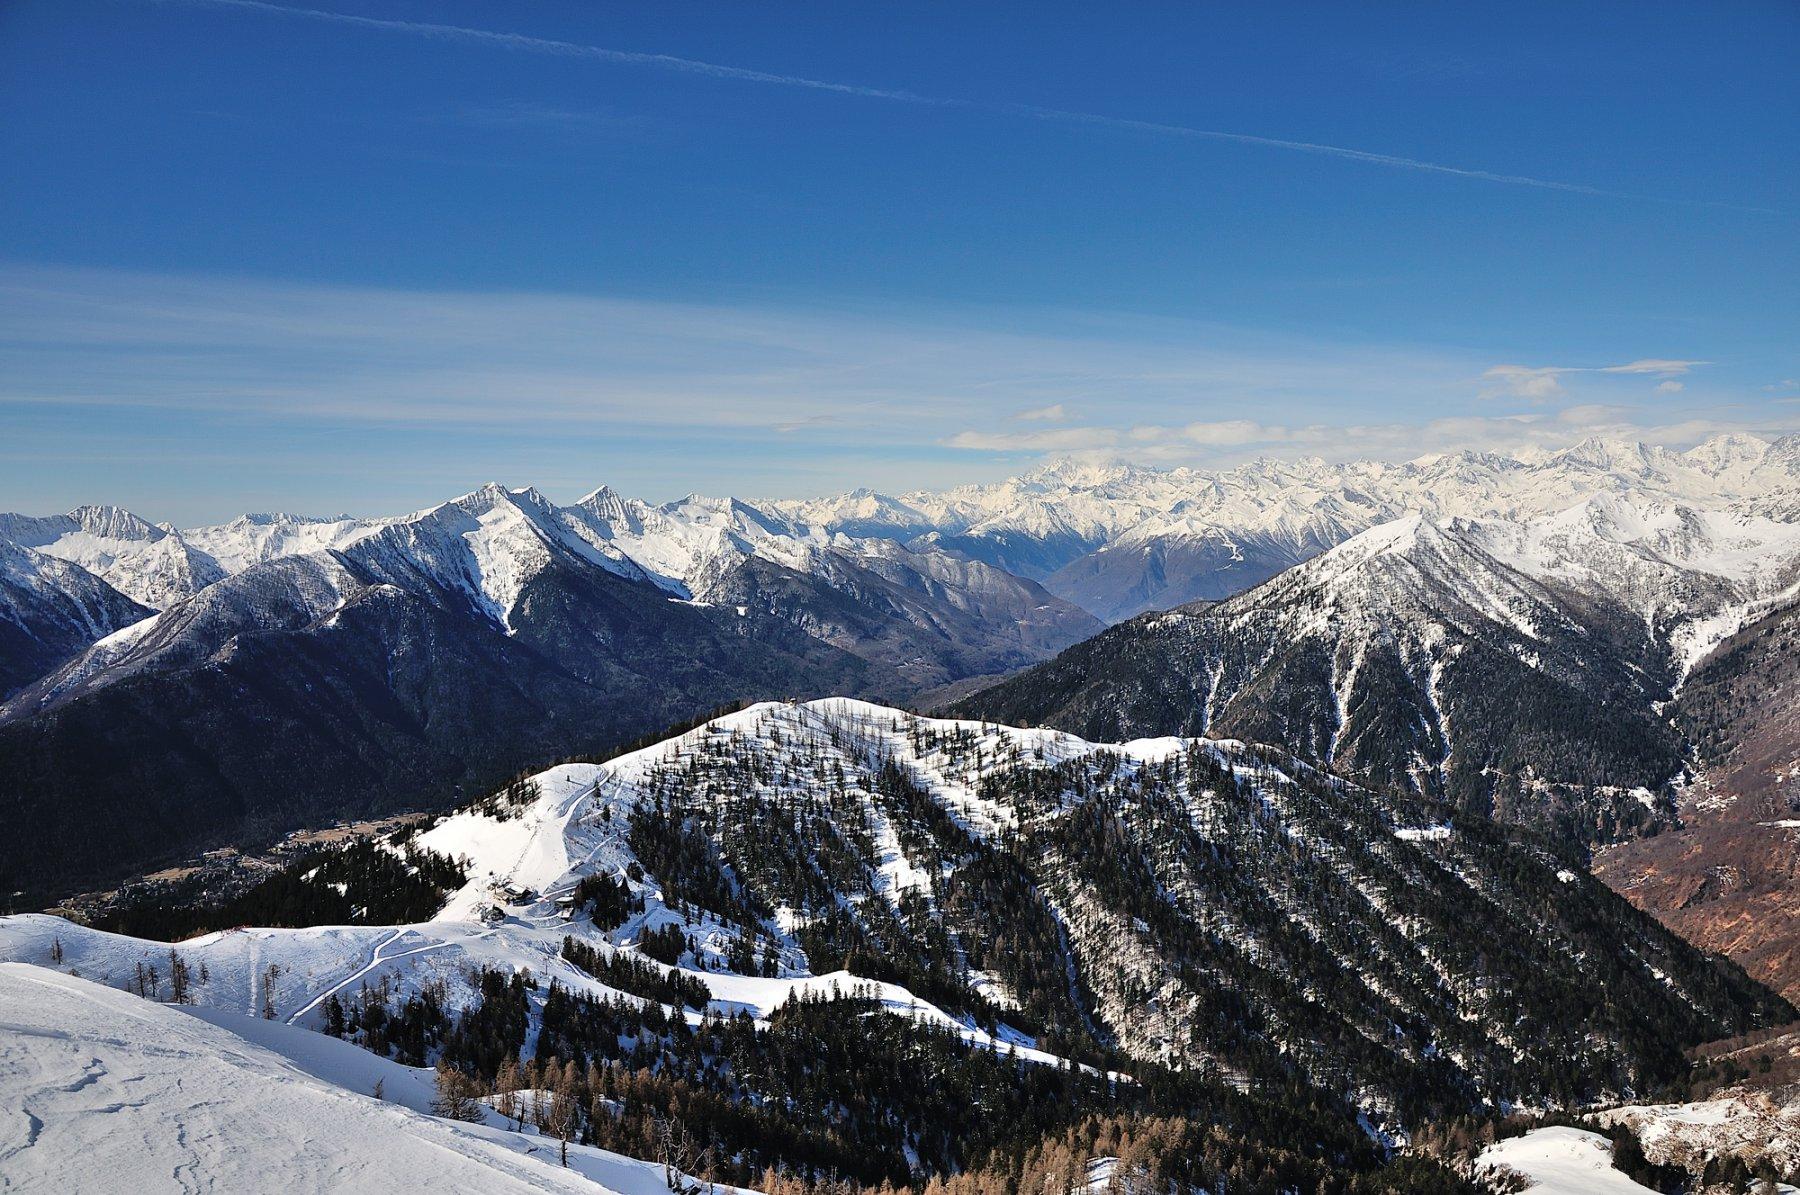 La Piana e la Val Vigezzo